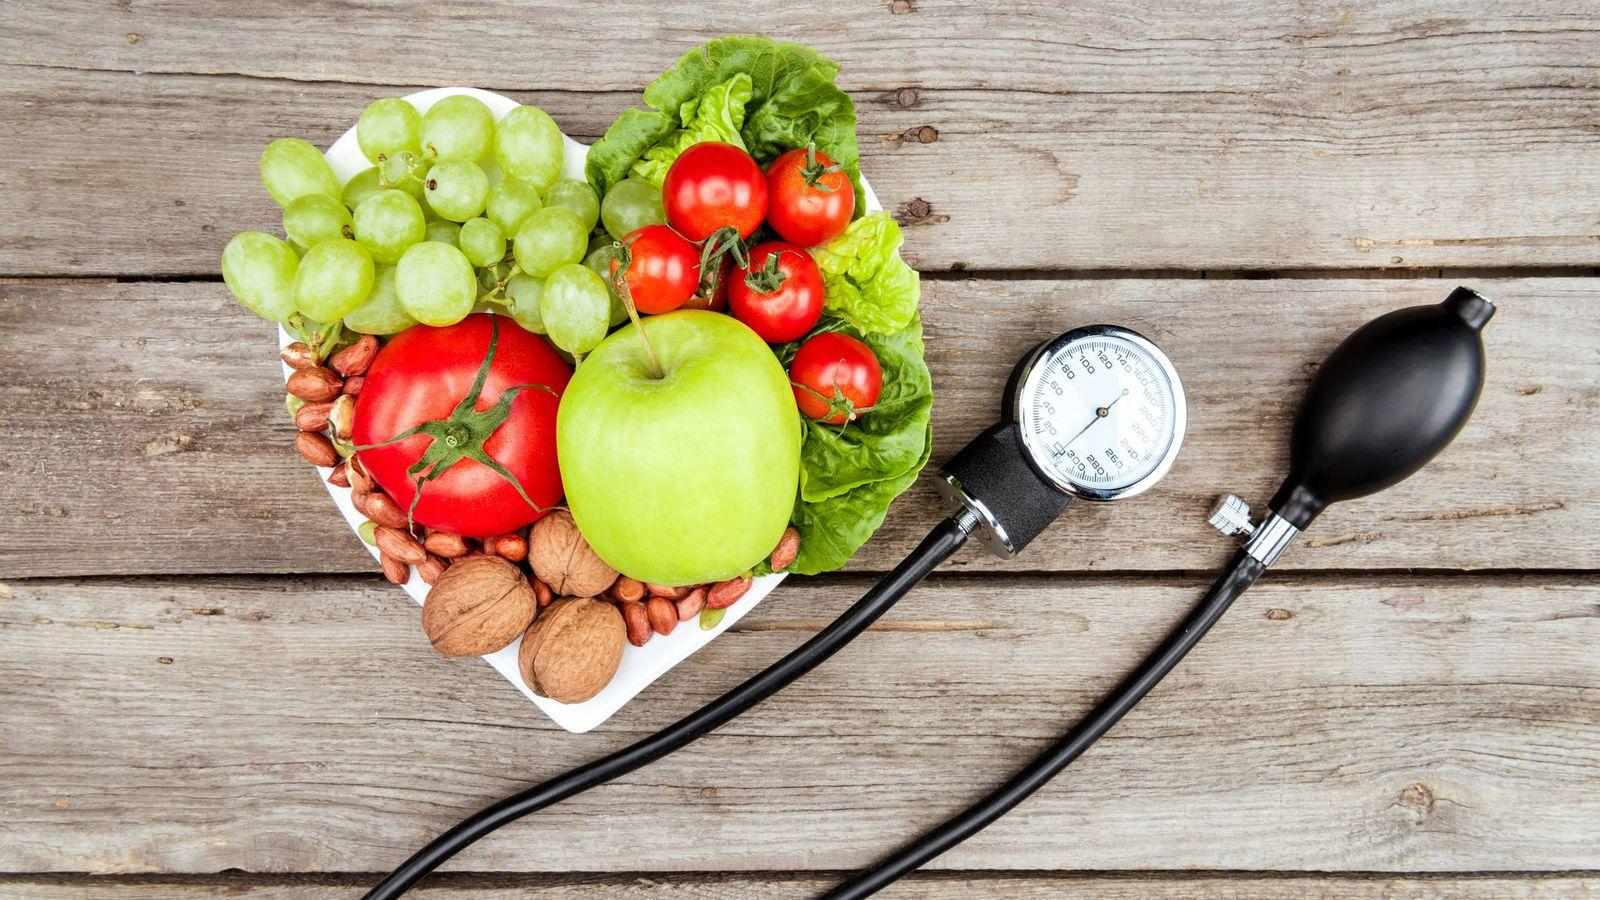 dash-la-dieta-para-bajar-la-presion-arterial